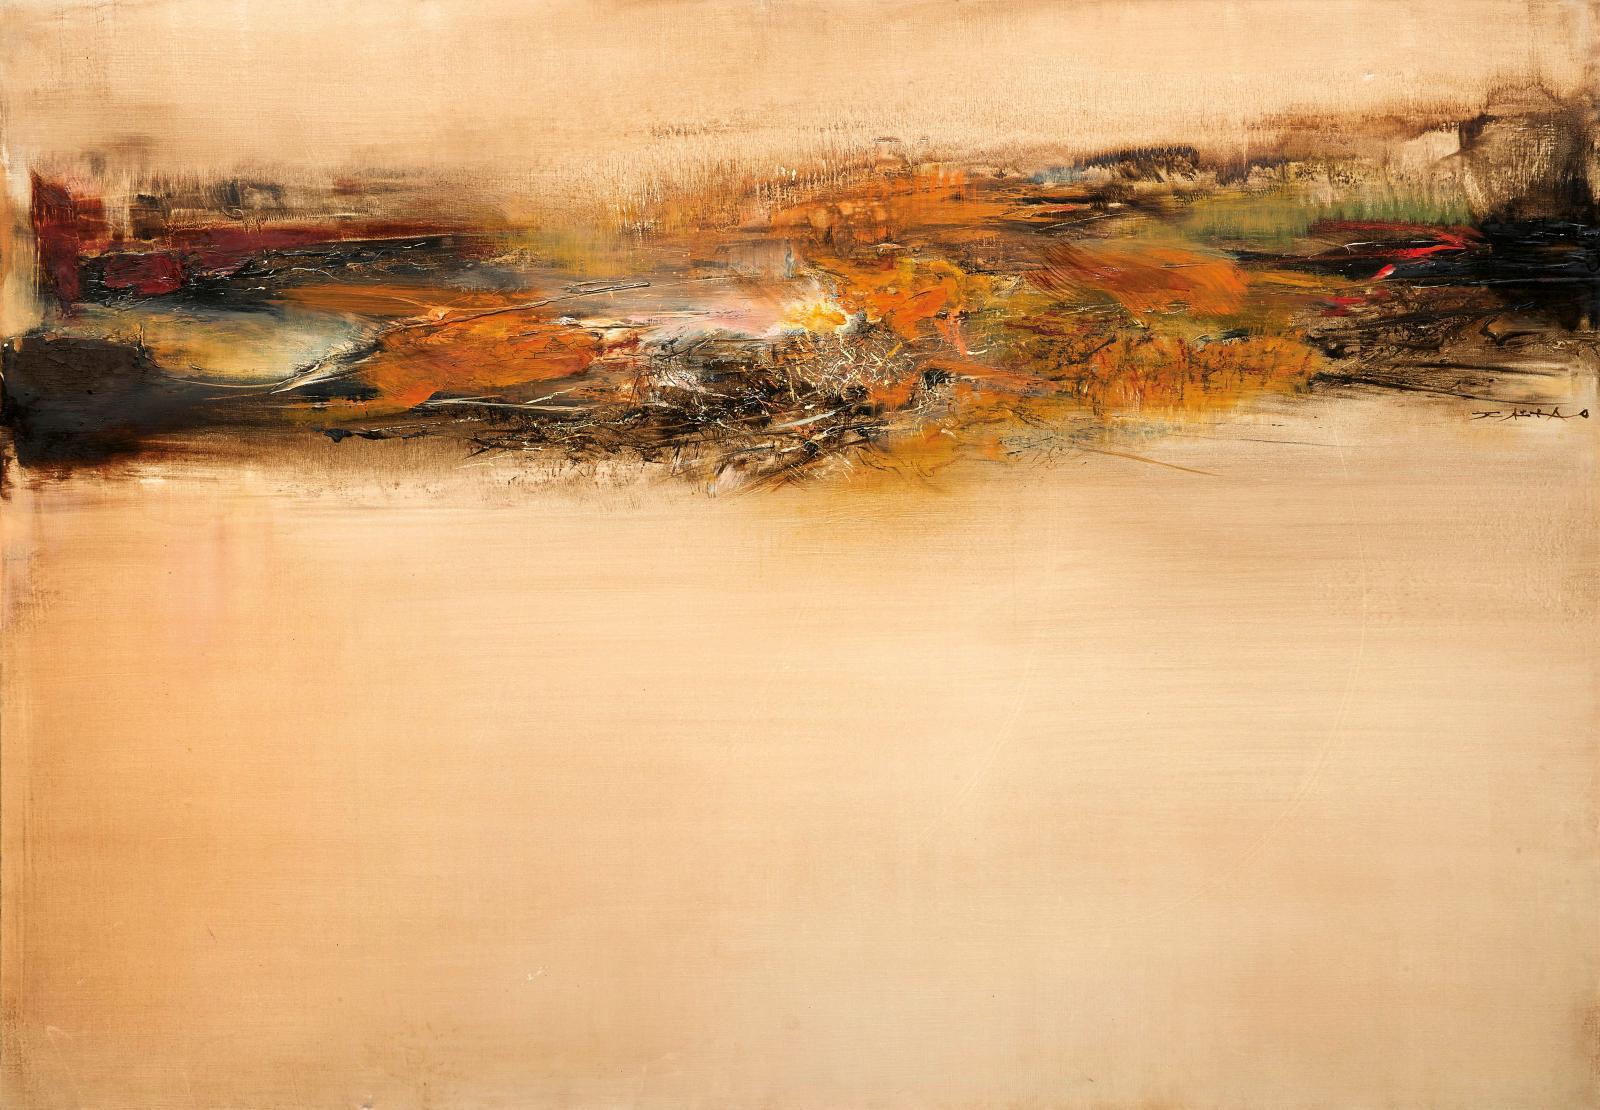 Zao-Wou-ki (1920-2013), 30.10.64- 11.04.78, huile sur toile, 114x162cm. Estimation: 700000/800000€